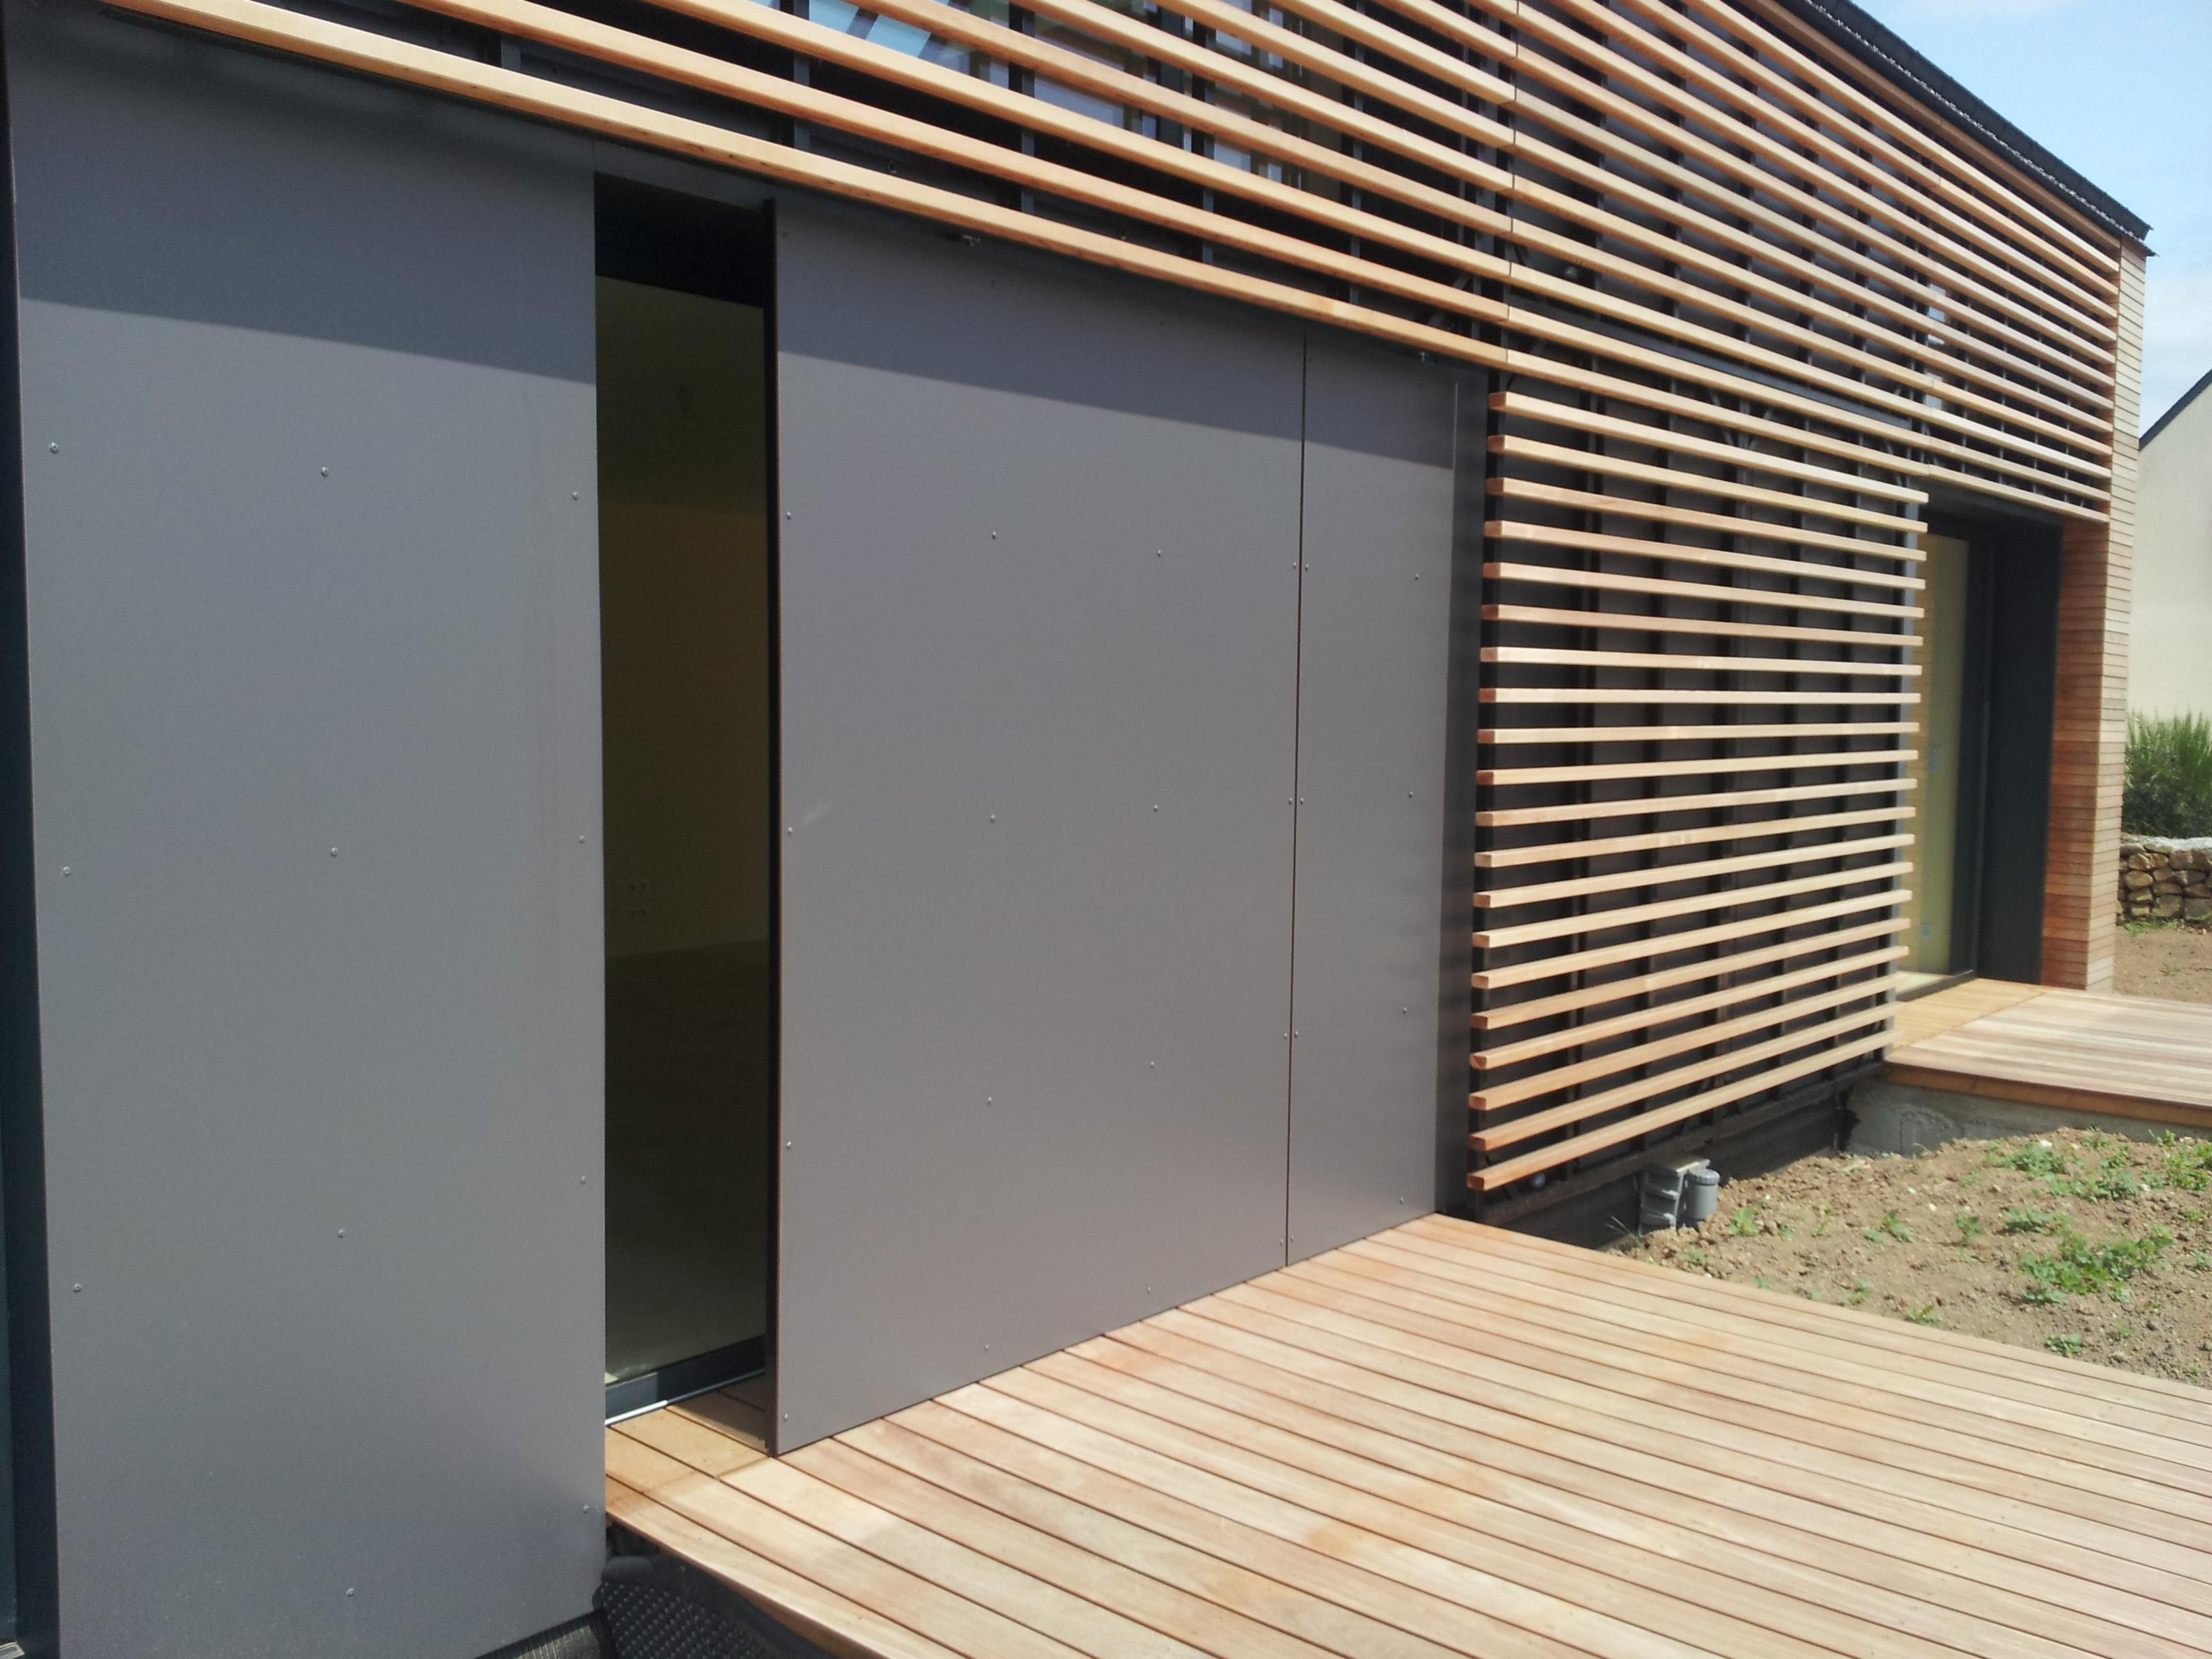 Bardage ajour en red cedar sign bois construction - Facade maison en bois ...